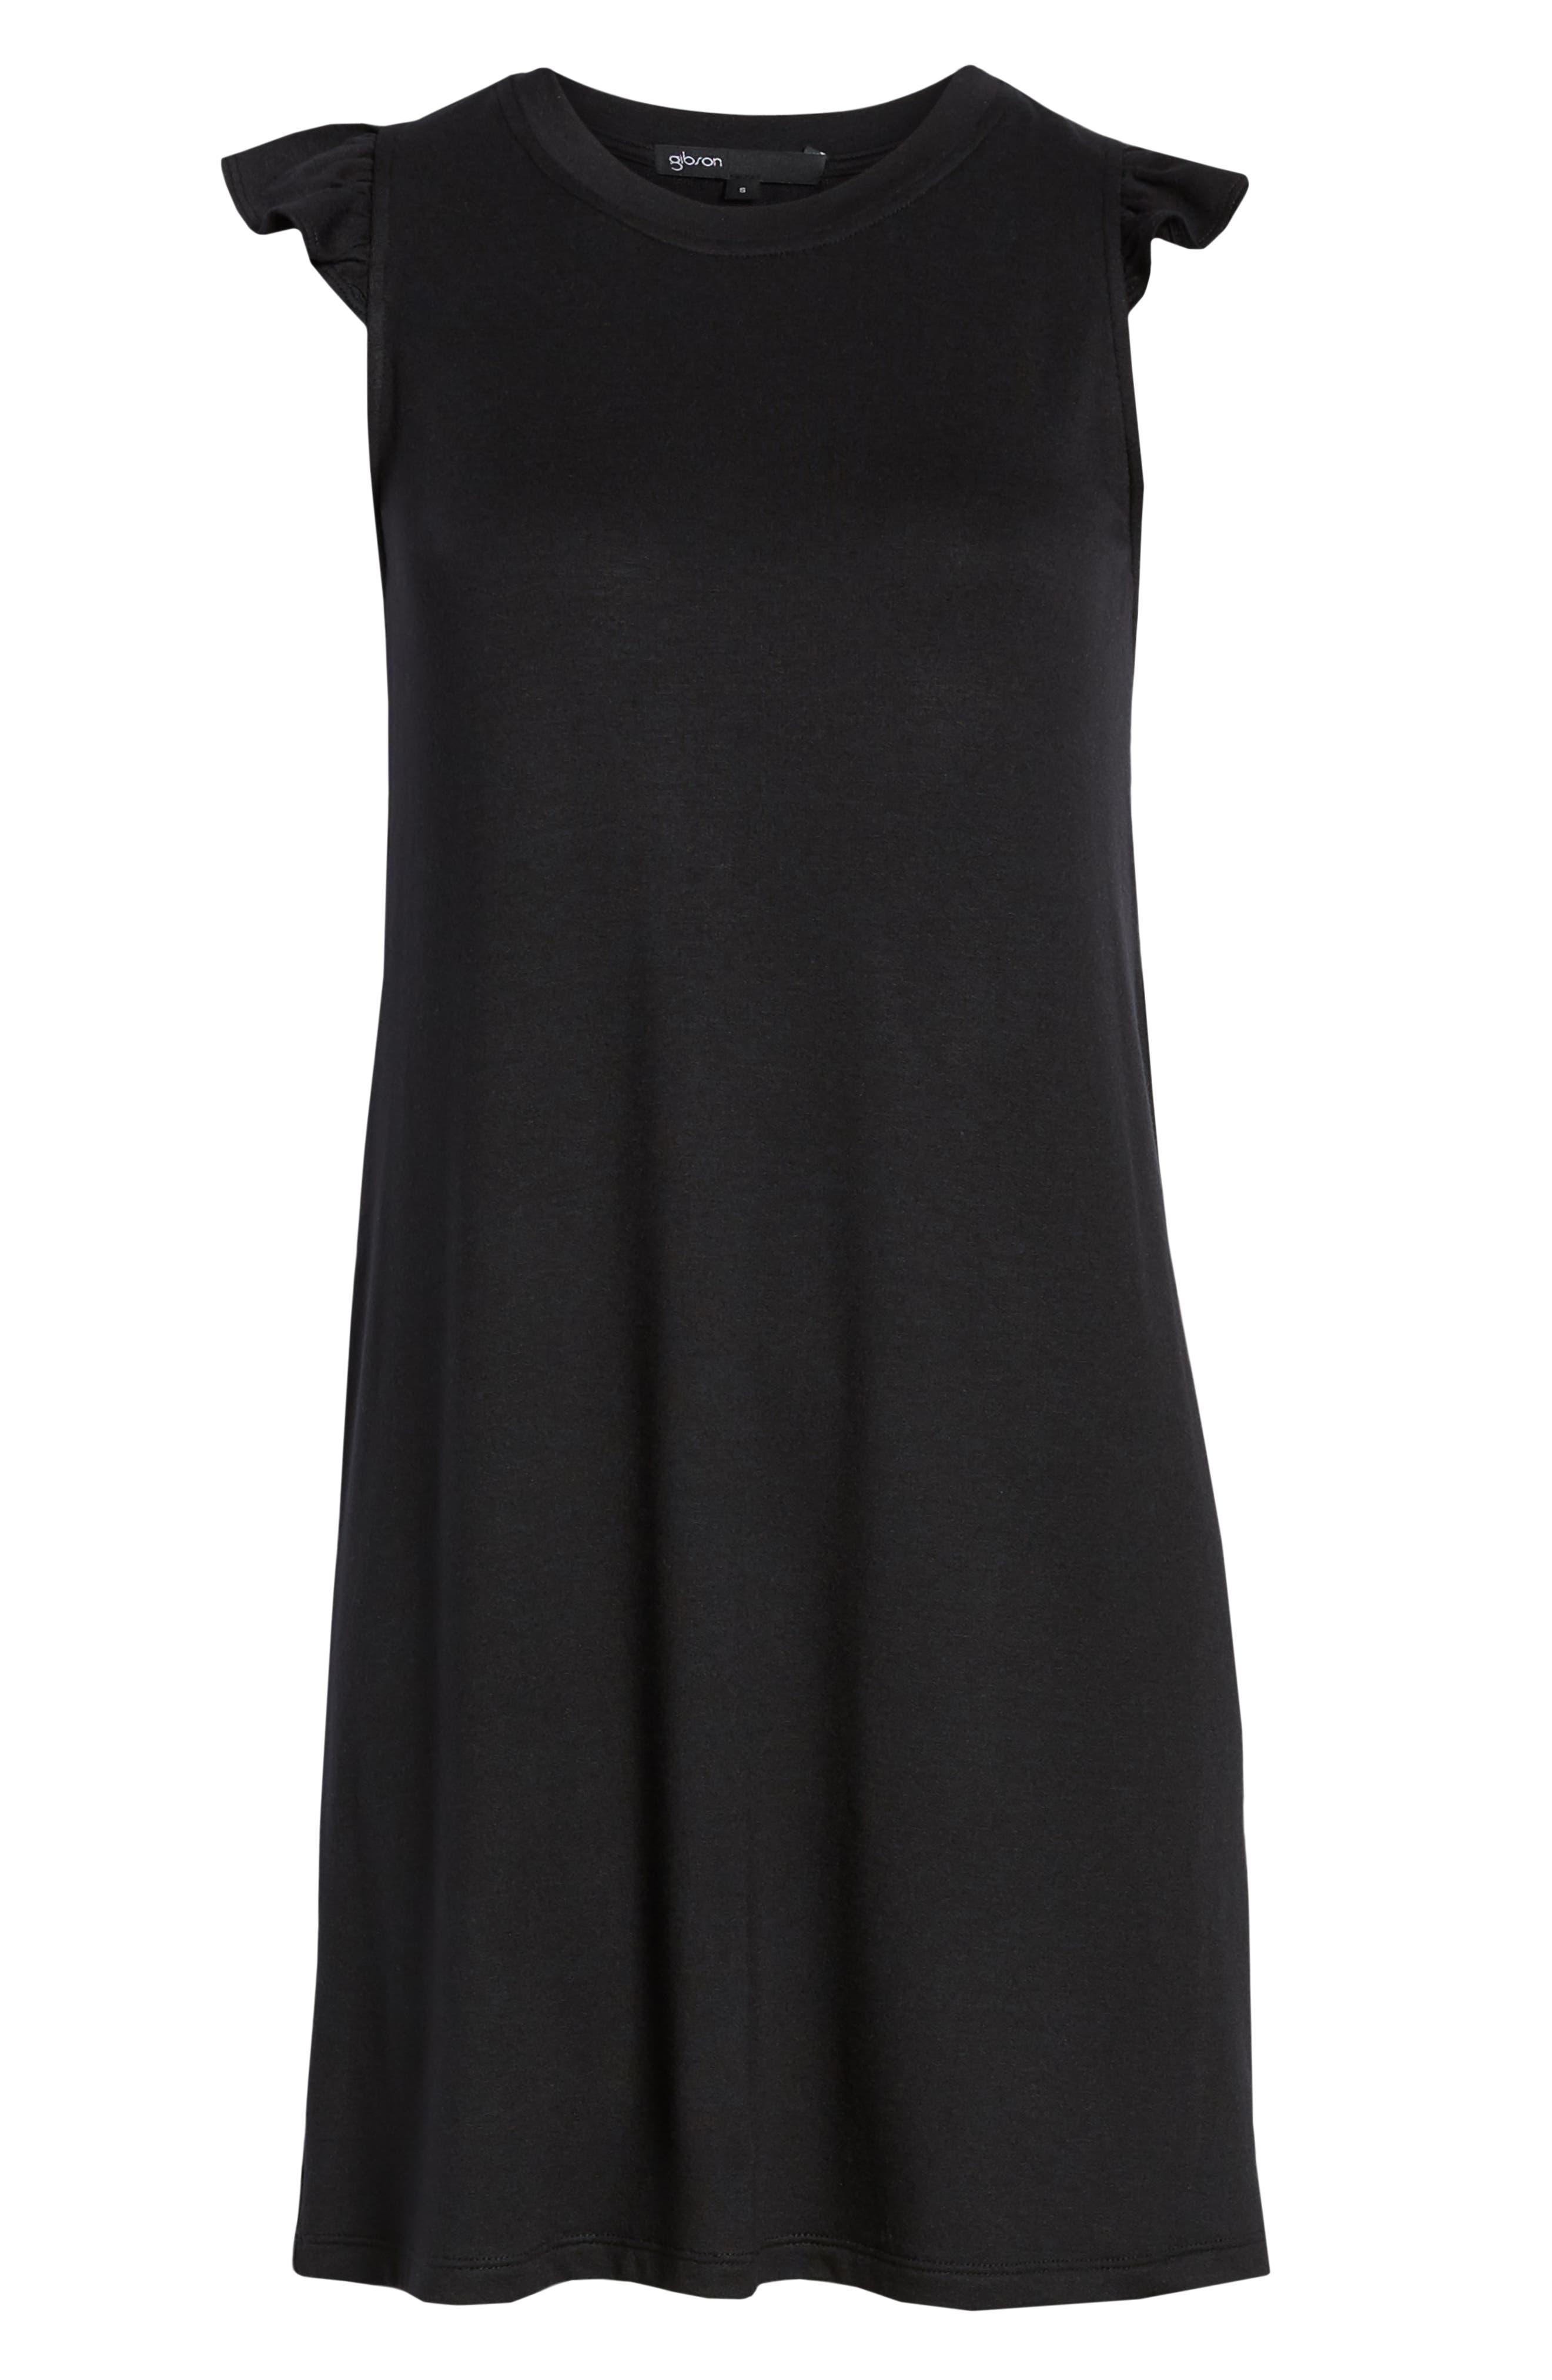 GIBSON, x Hi Sugarplum! Laguna Soft Jersey Ruffle Back T-Shirt Dress, Alternate thumbnail 7, color, BLACK